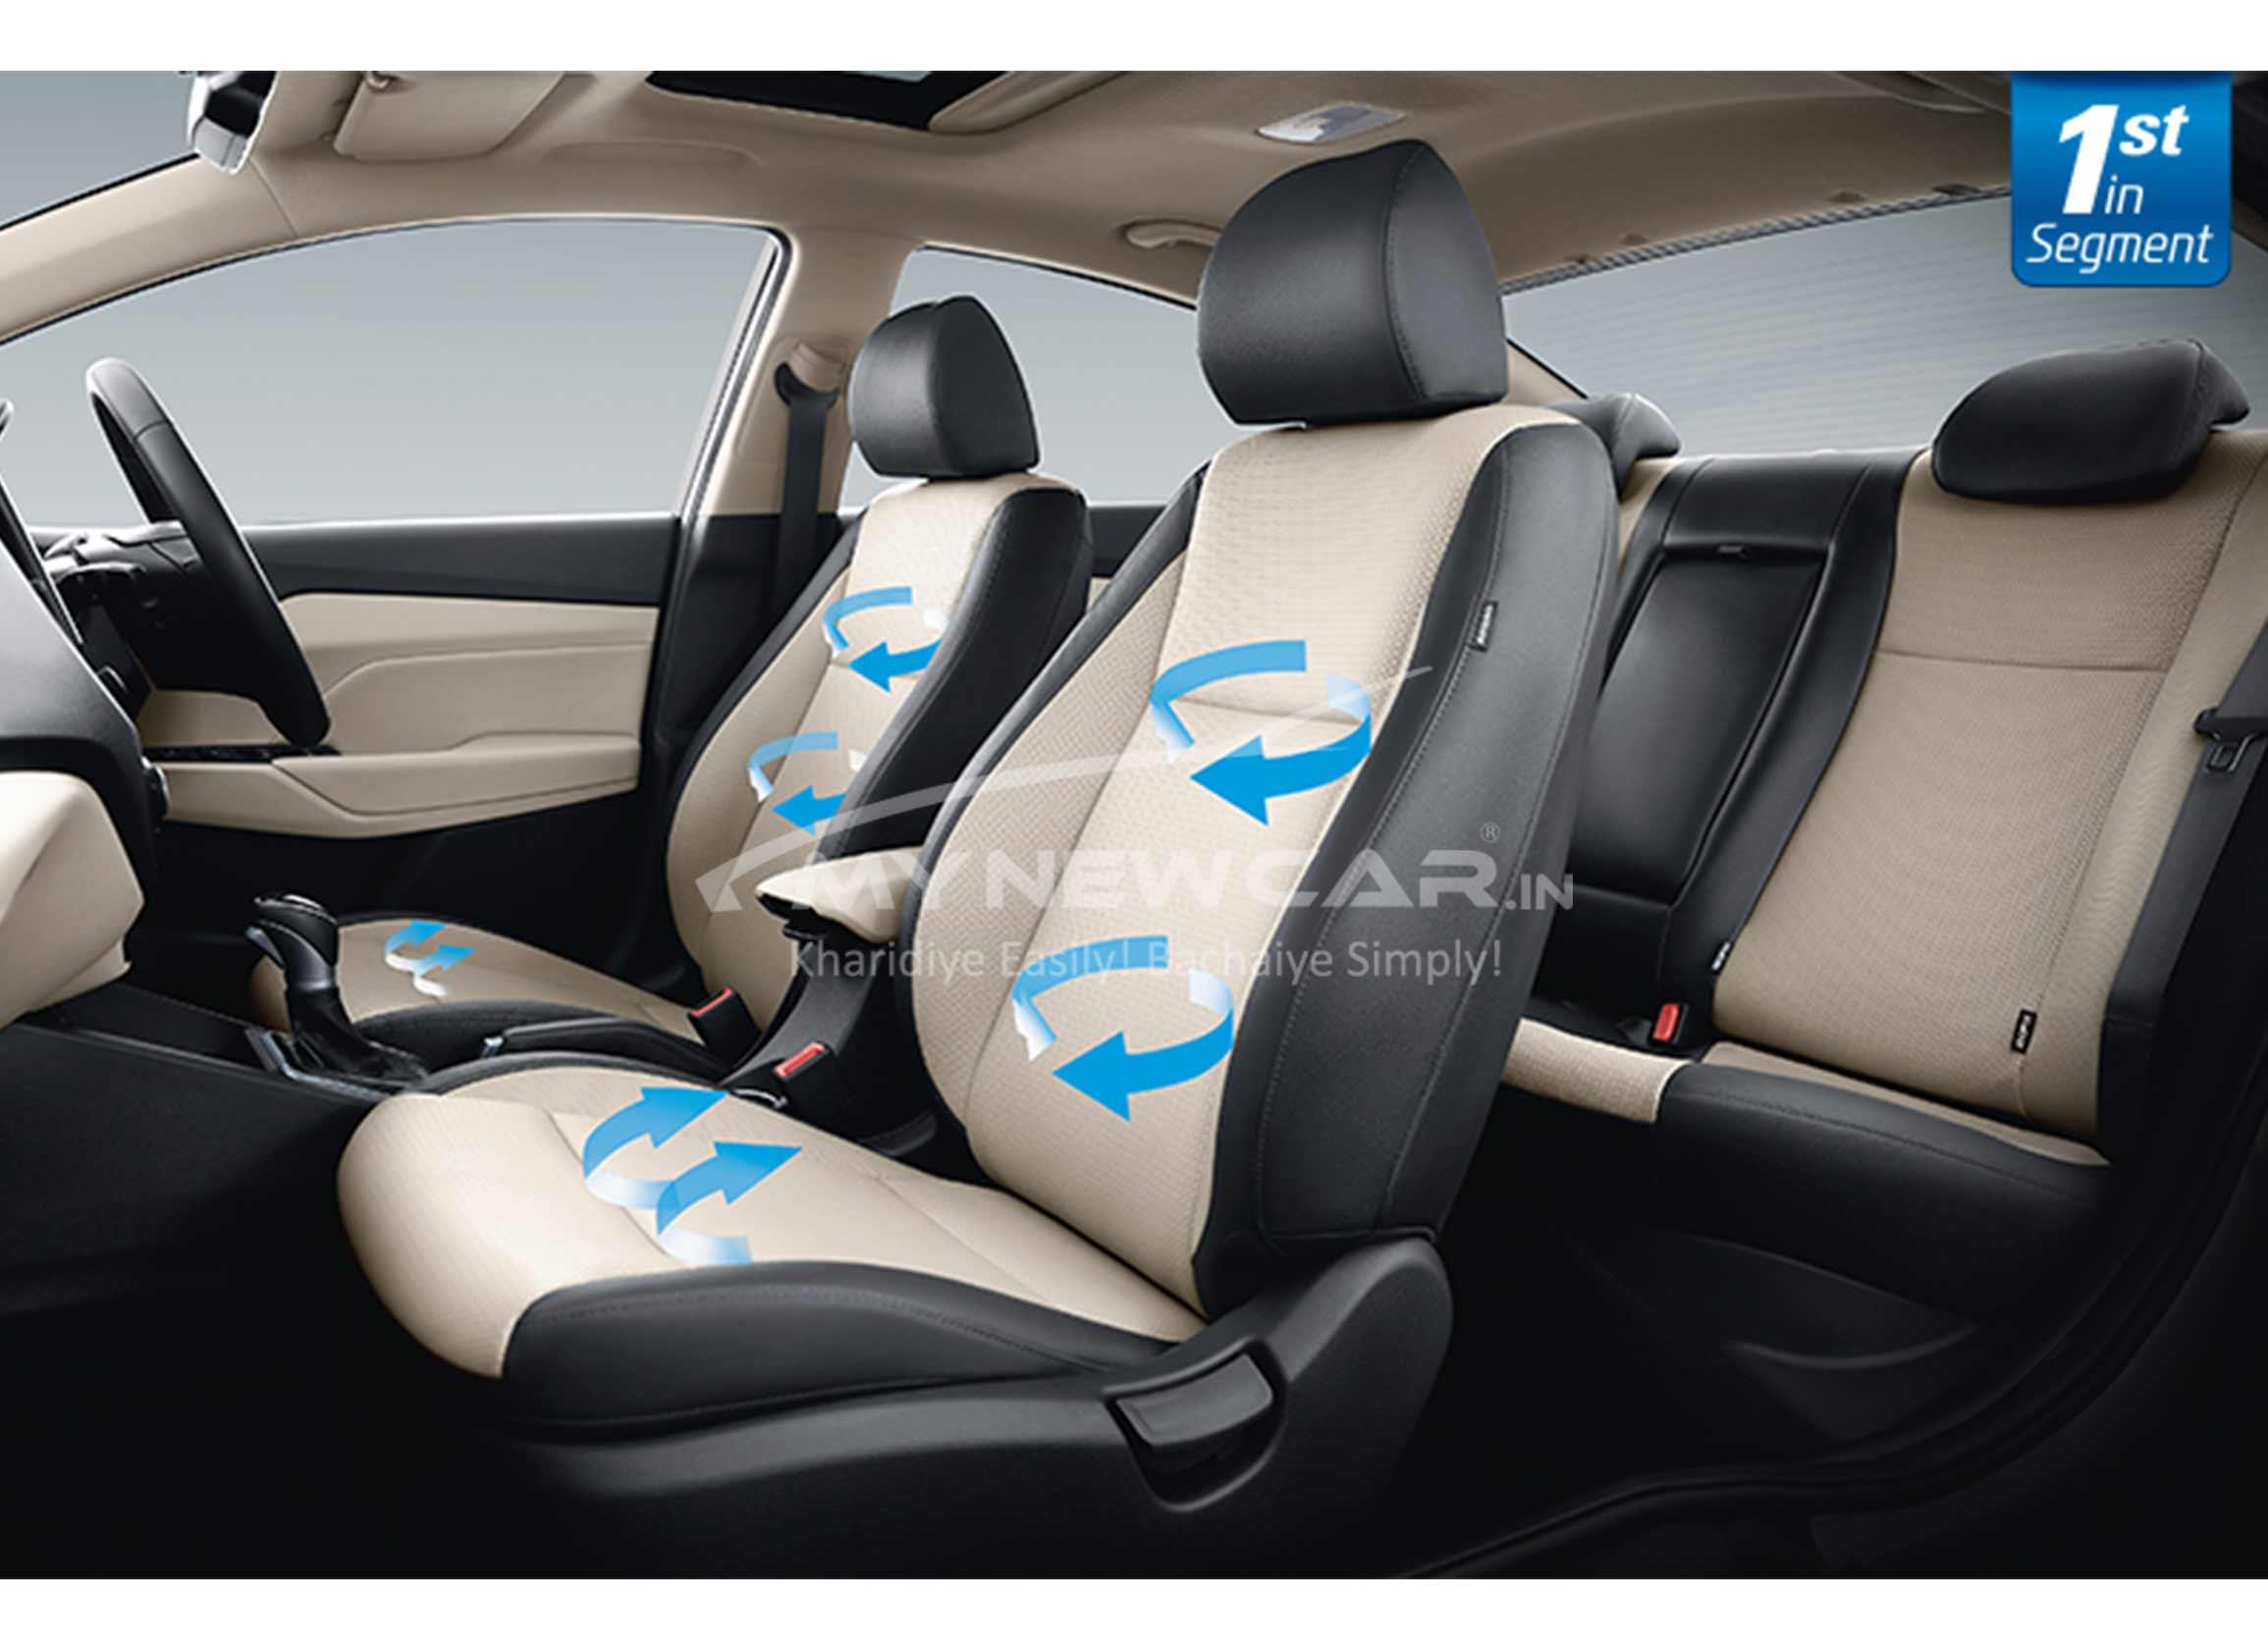 New Hyundai Verna 2020 interior